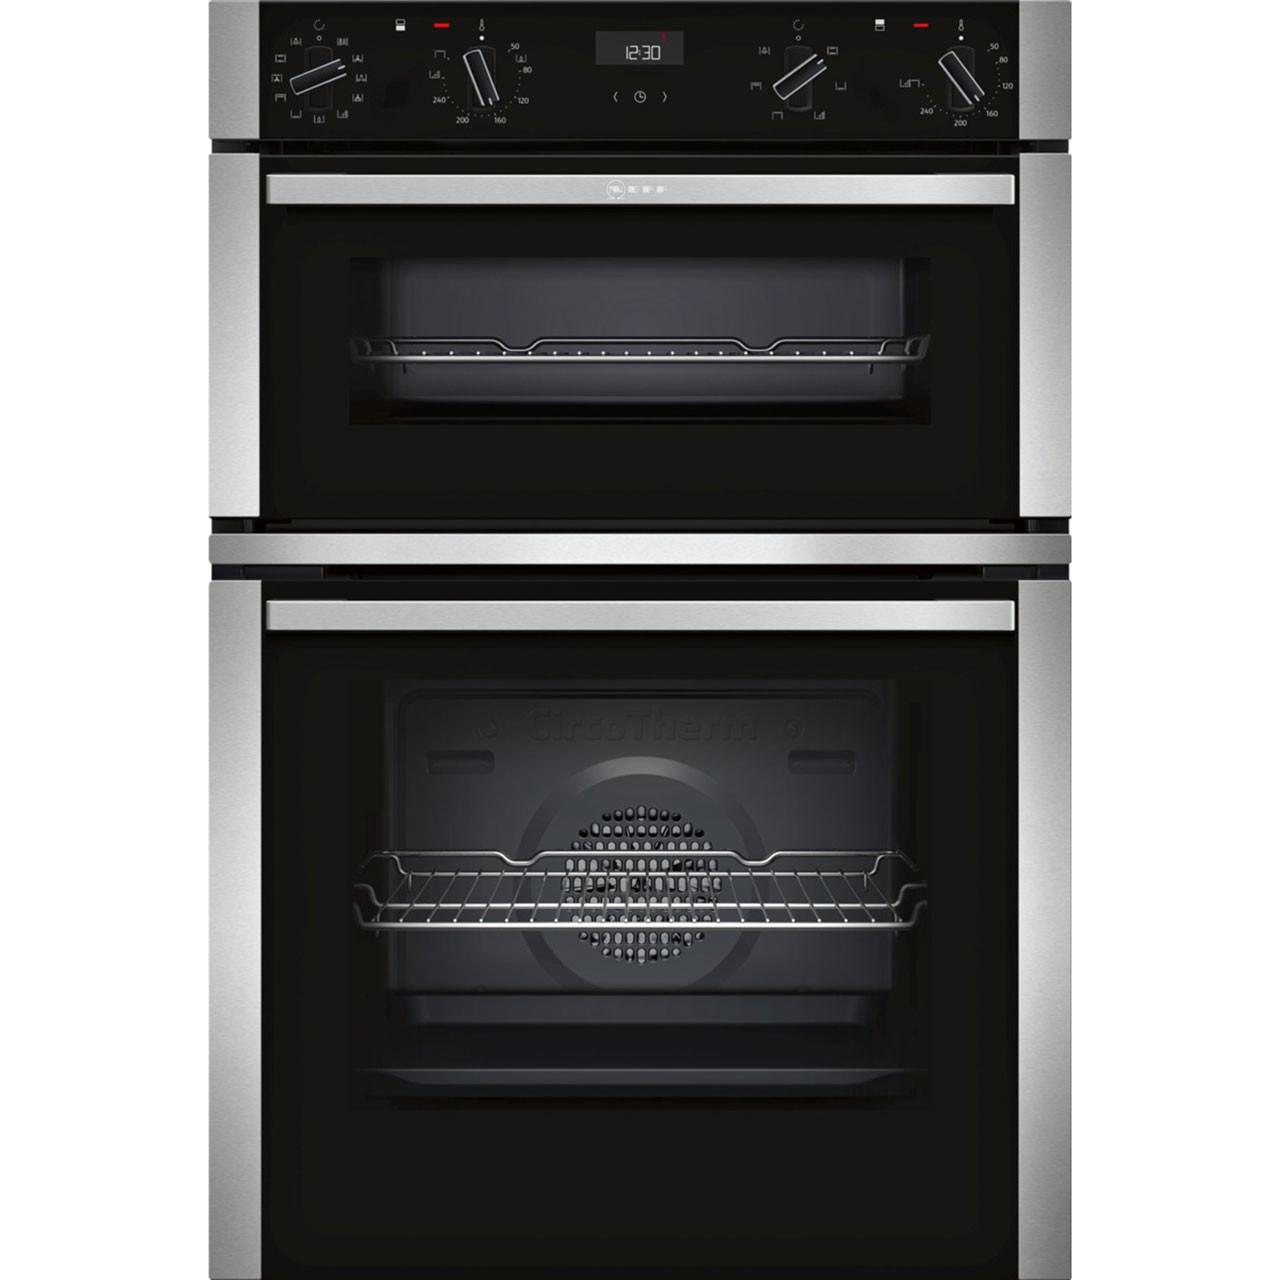 Neff N50 Black Double Oven U1ACE5HN0B